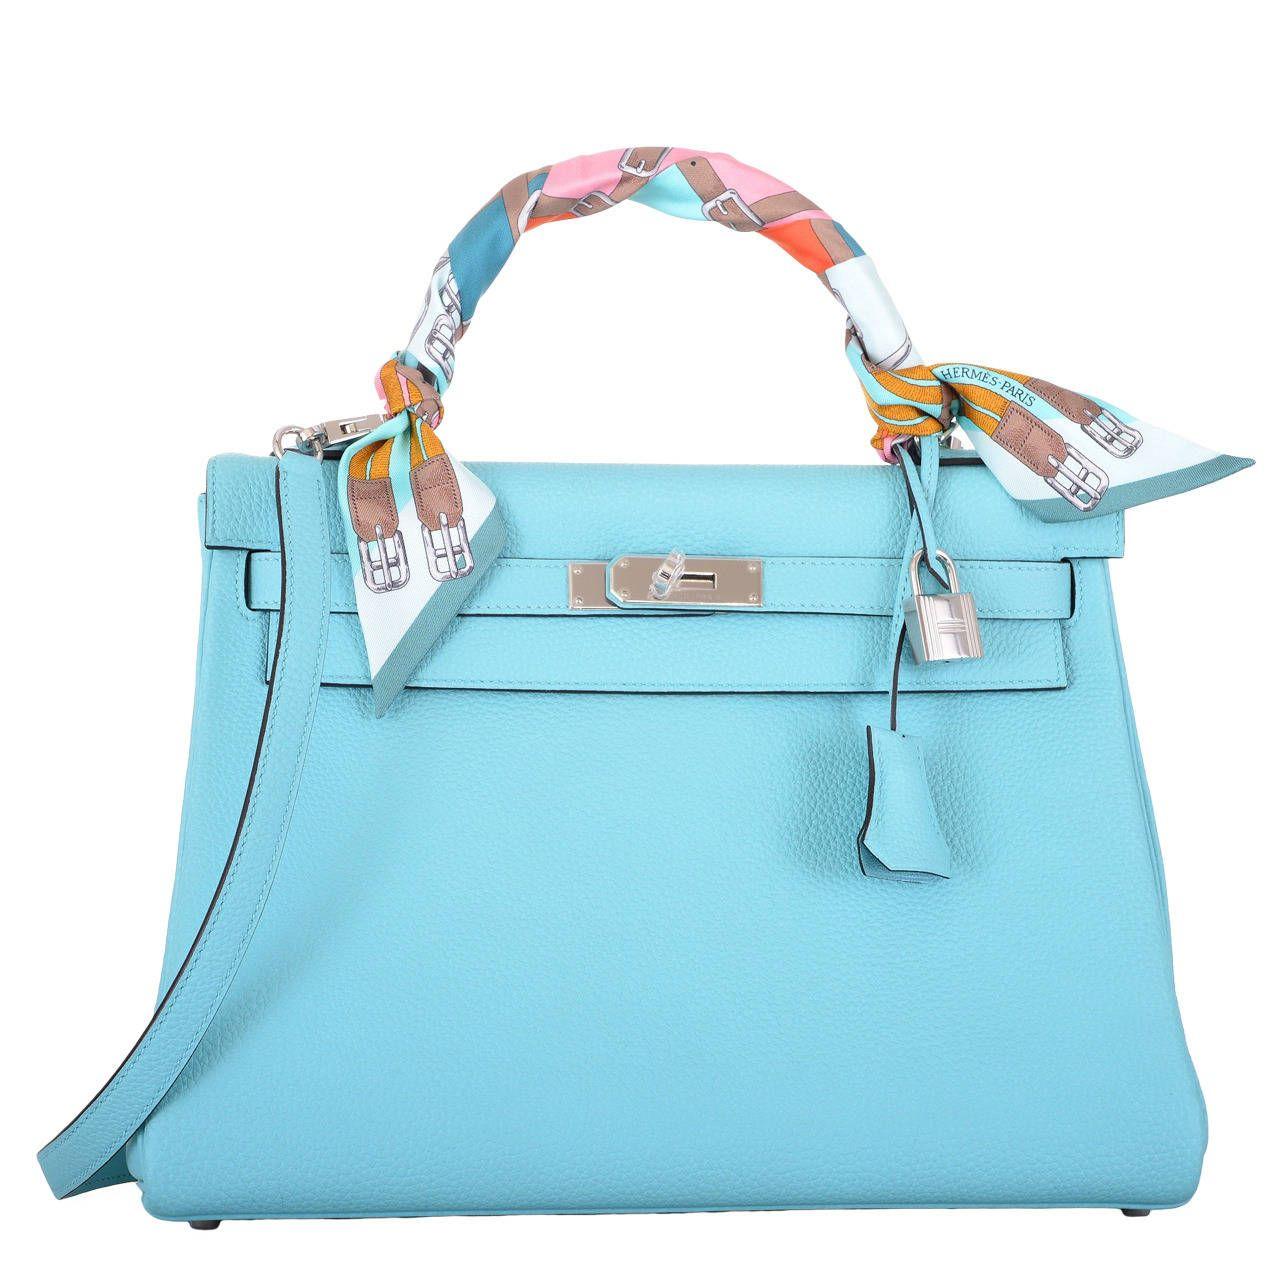 ed8f42db49a0 MUST C NEW COLOR BAG HERMES KELLY Bag BLUE BLEU ATOLL TOGO PALL HARDWARE